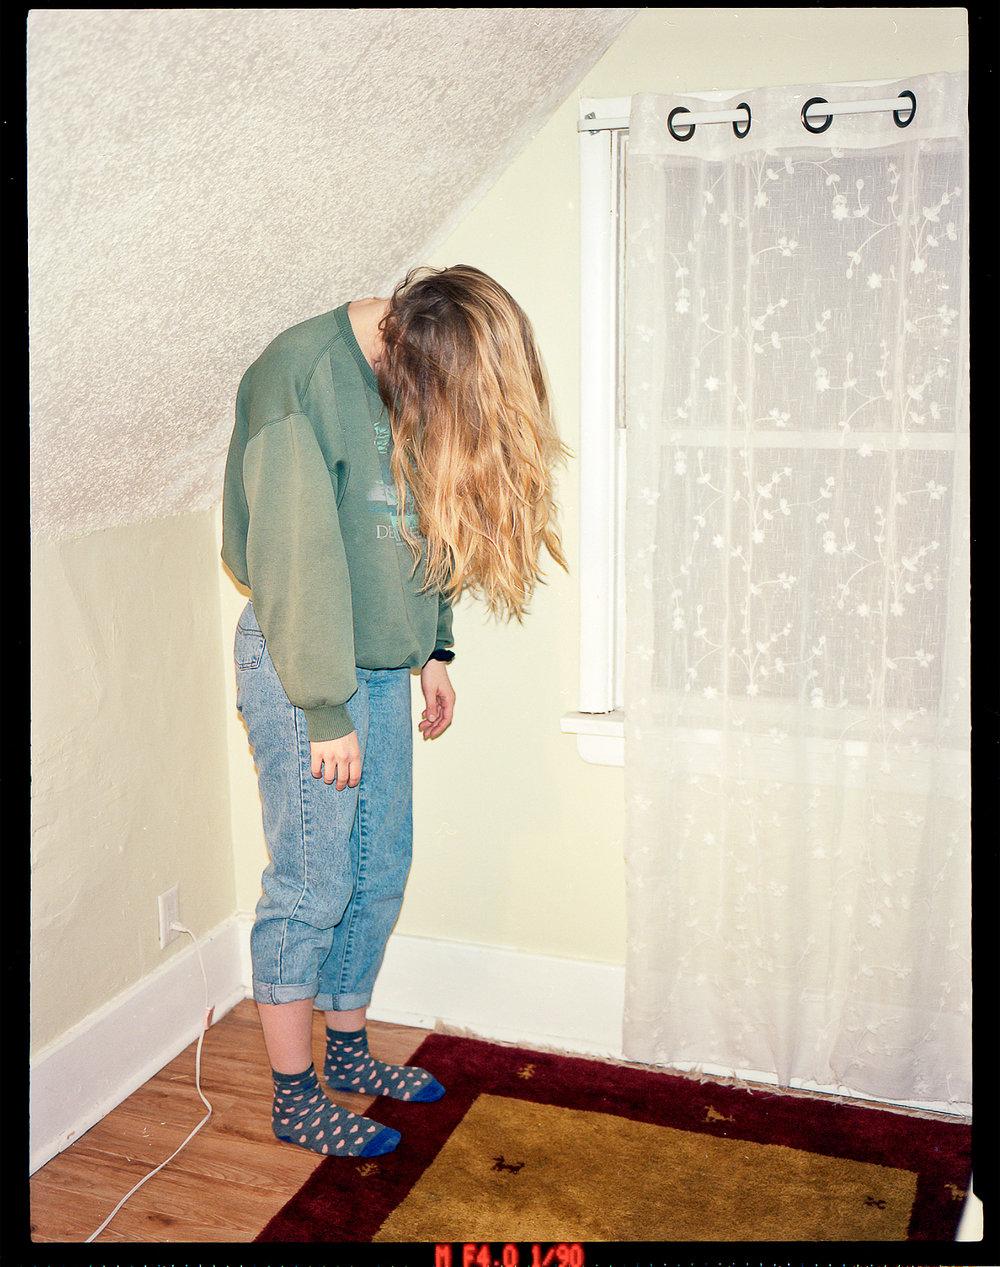 Calgary-Trip_-Janette-Fashion-Editorial-Shoot-Kodak-Portra-400_Fuji-GA-645-Eerie-Somber-Portrait.jpg